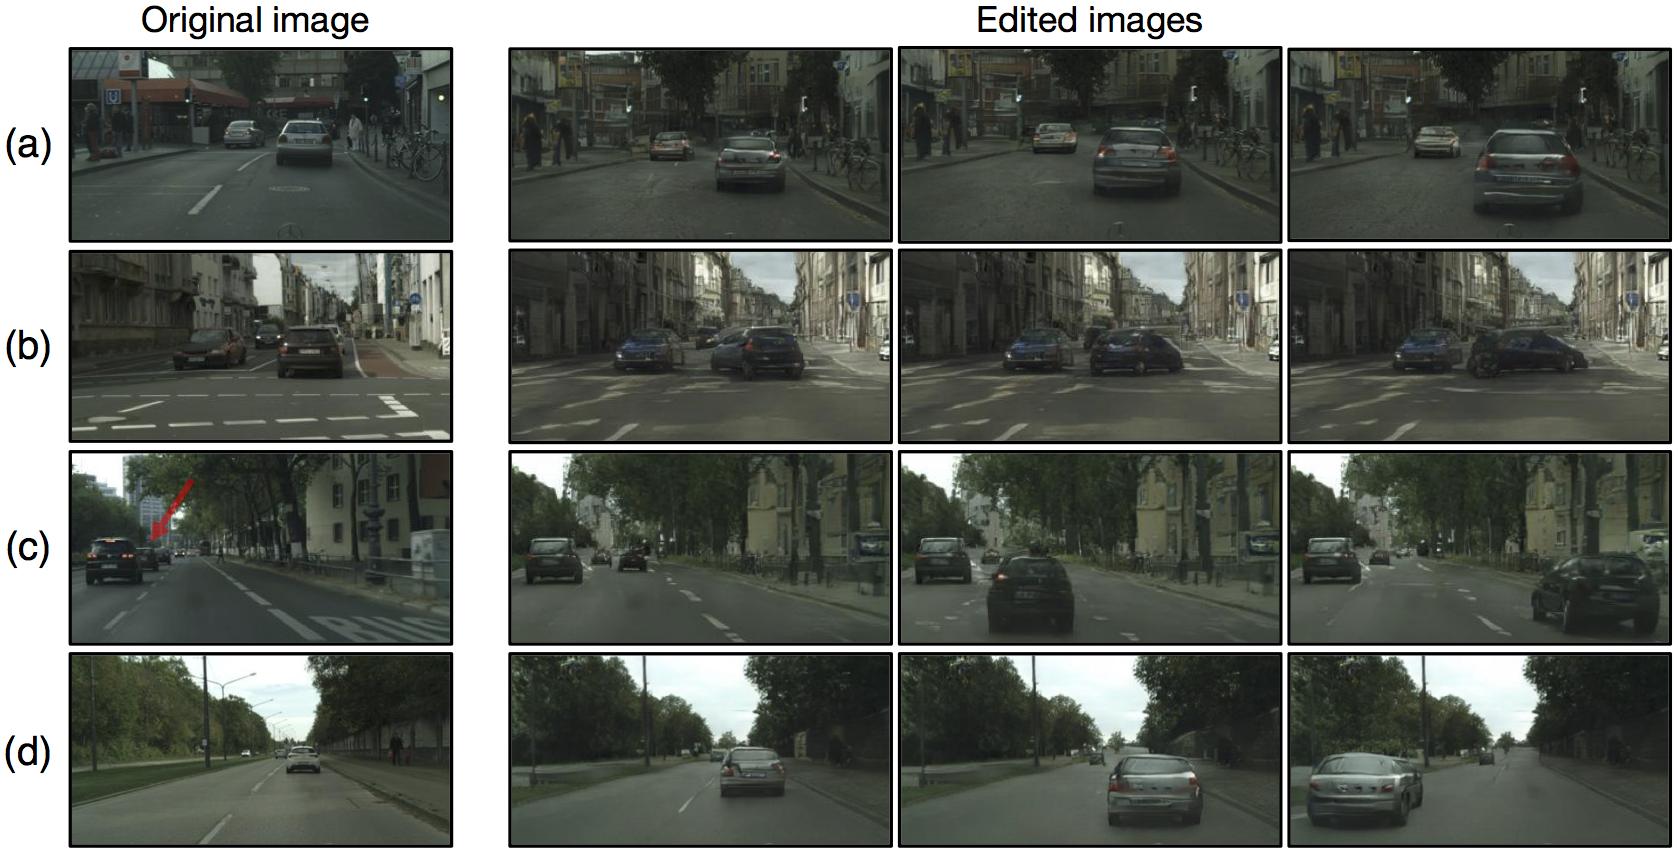 3D-Aware Scene Manipulation via Inverse Graphics